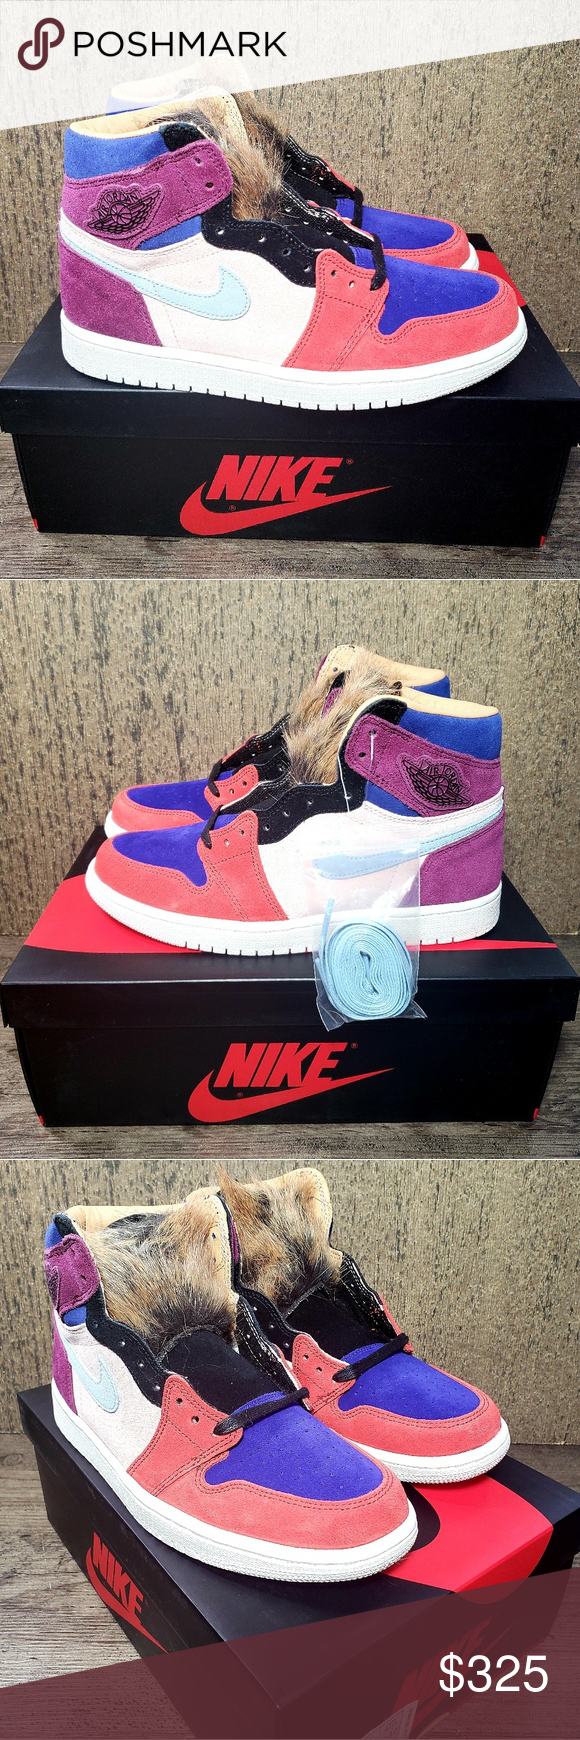 ce62a8ac553e Nike Air Jordan 1 High OG Court Lux Aleali May NE BRAND-NEW - Women s